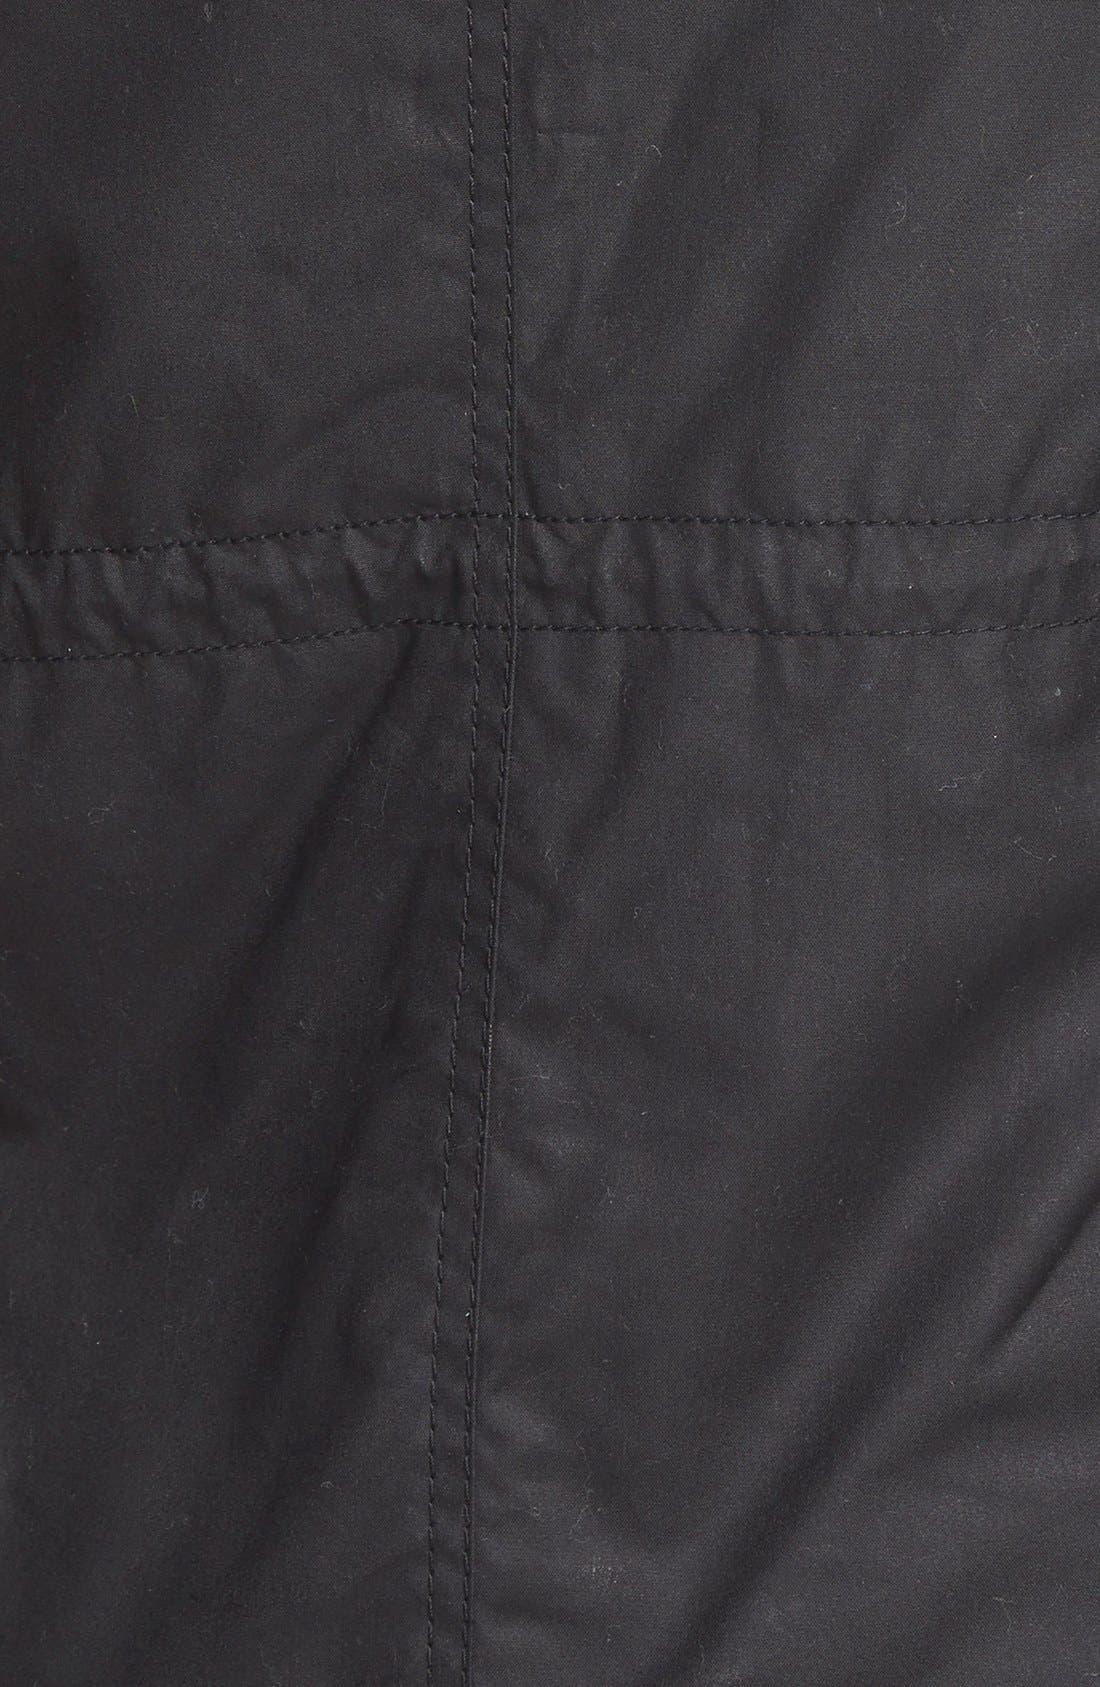 BARBOUR,                             'Kelsall' FauxFur & FauxShearling TrimWaxed CottonParka,                             Alternate thumbnail 2, color,                             001